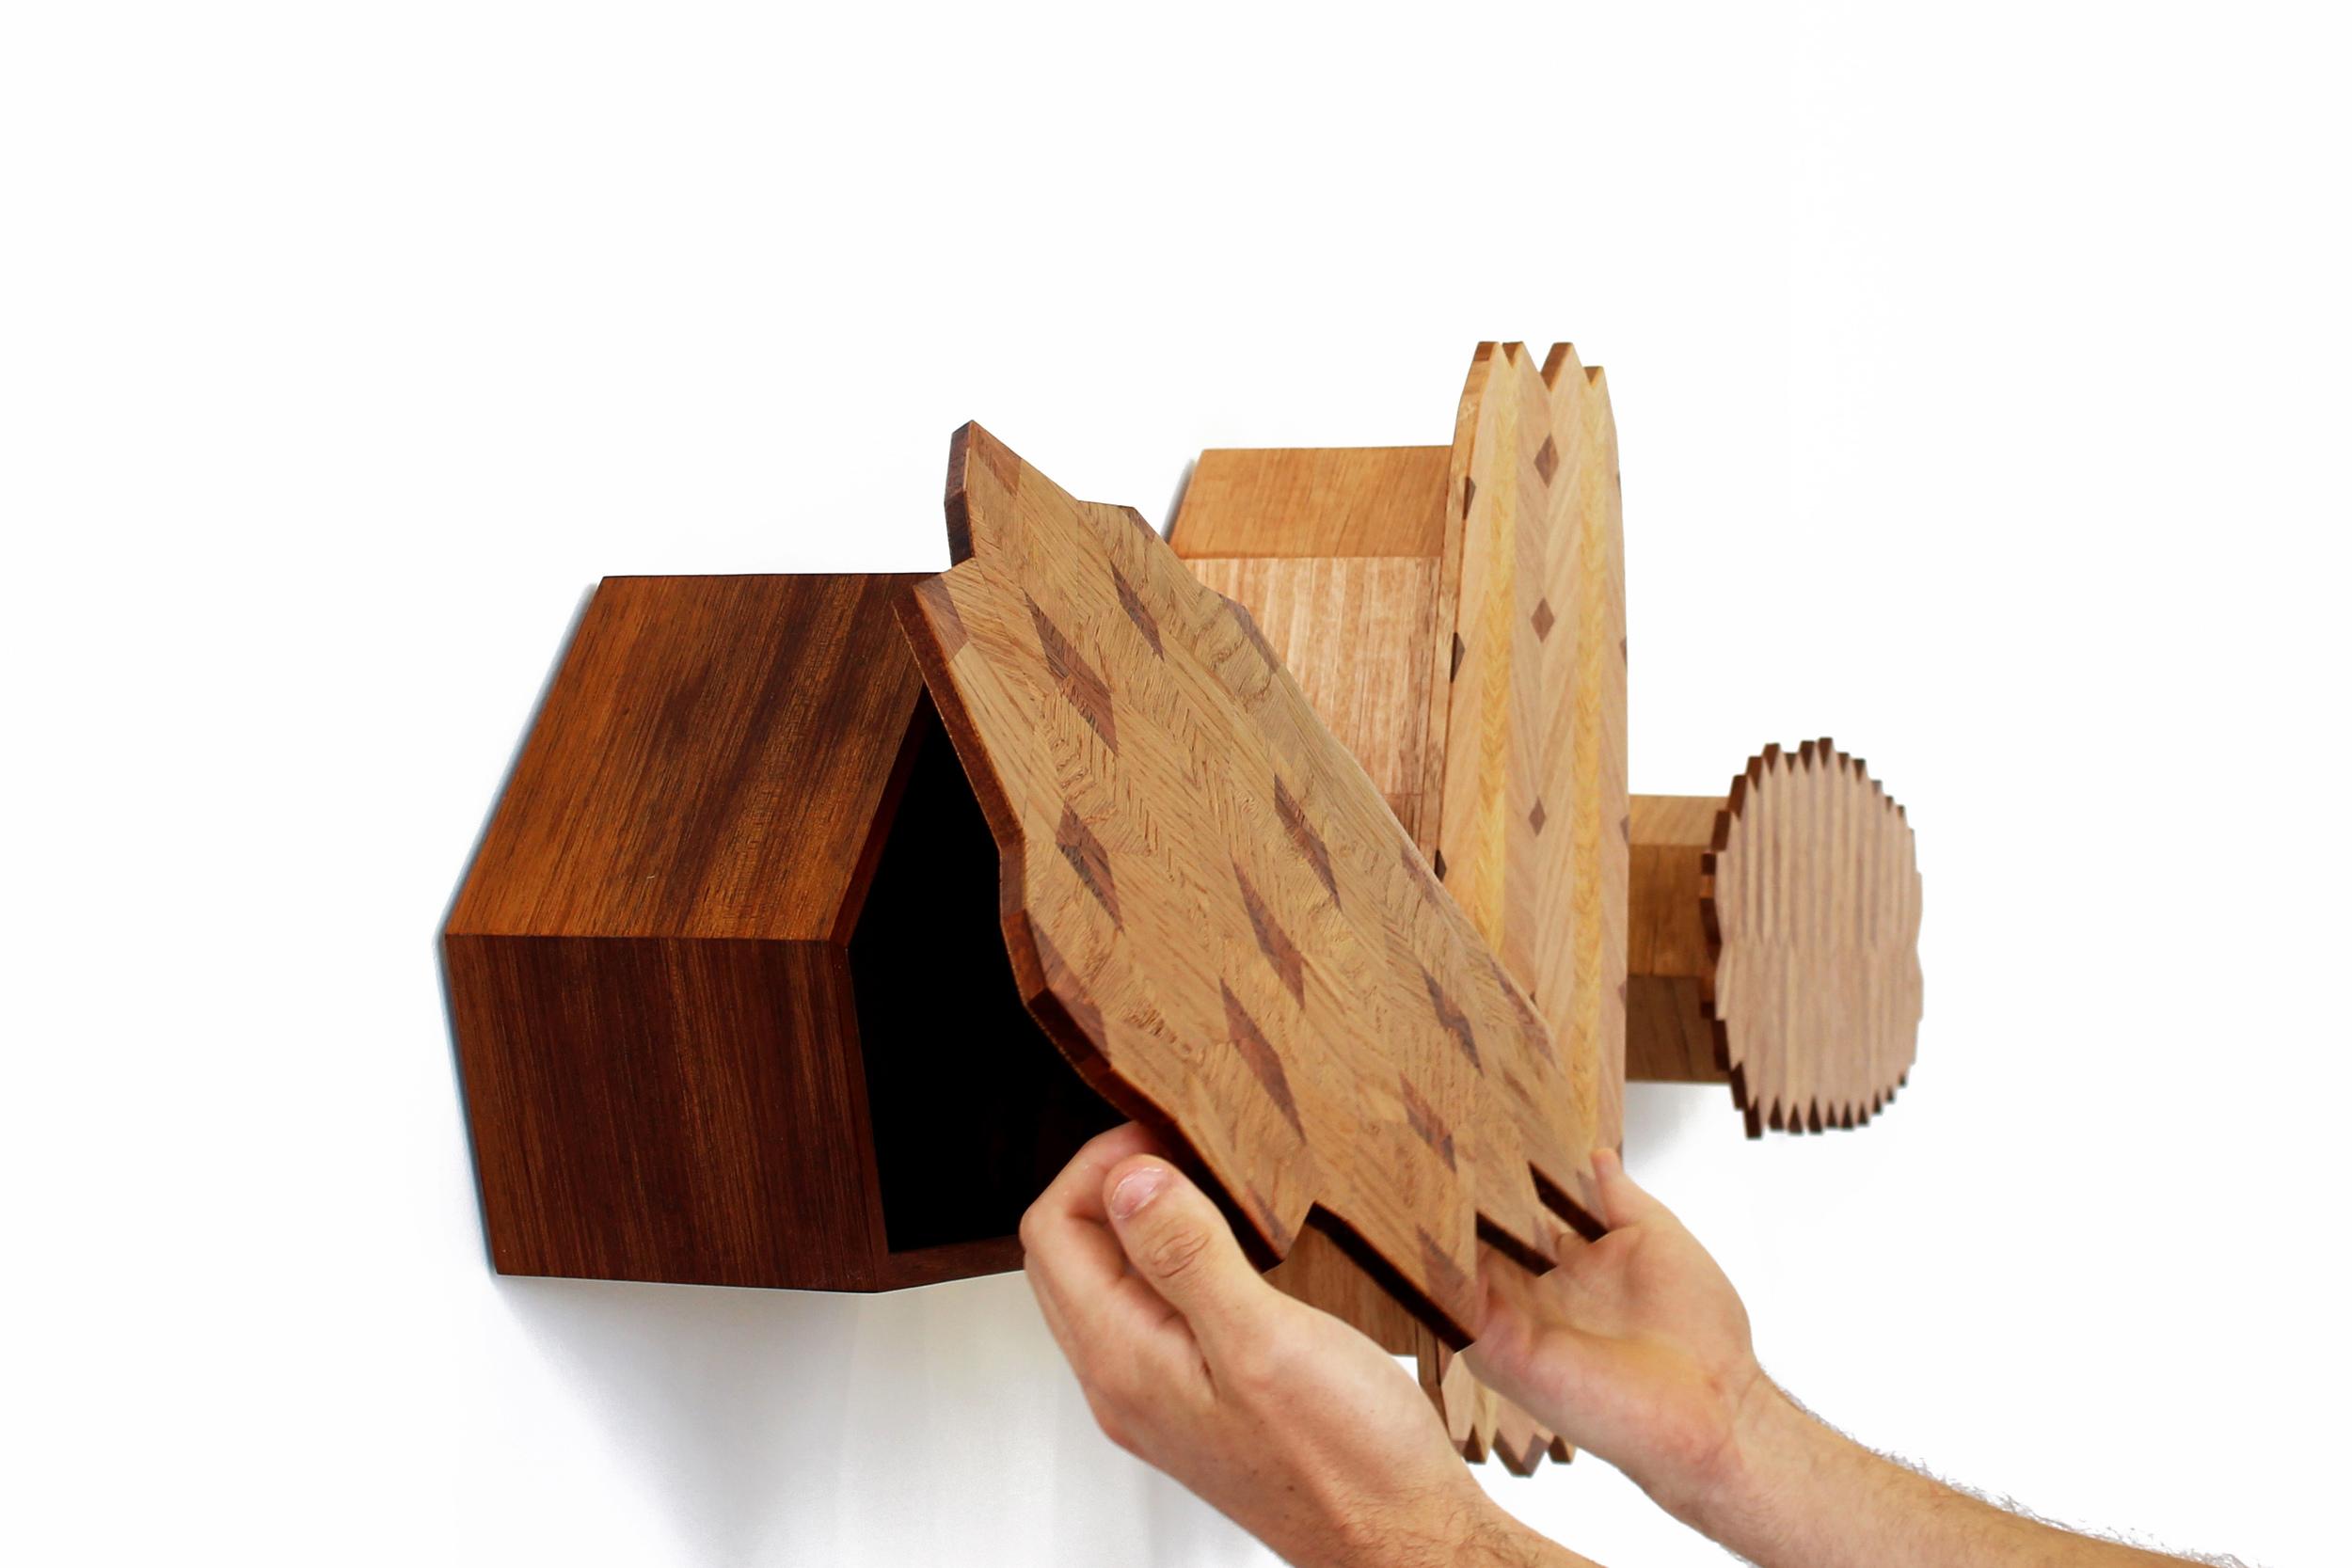 Chelsea lemon furniture design canberra australia parquetry pinecone cabinet